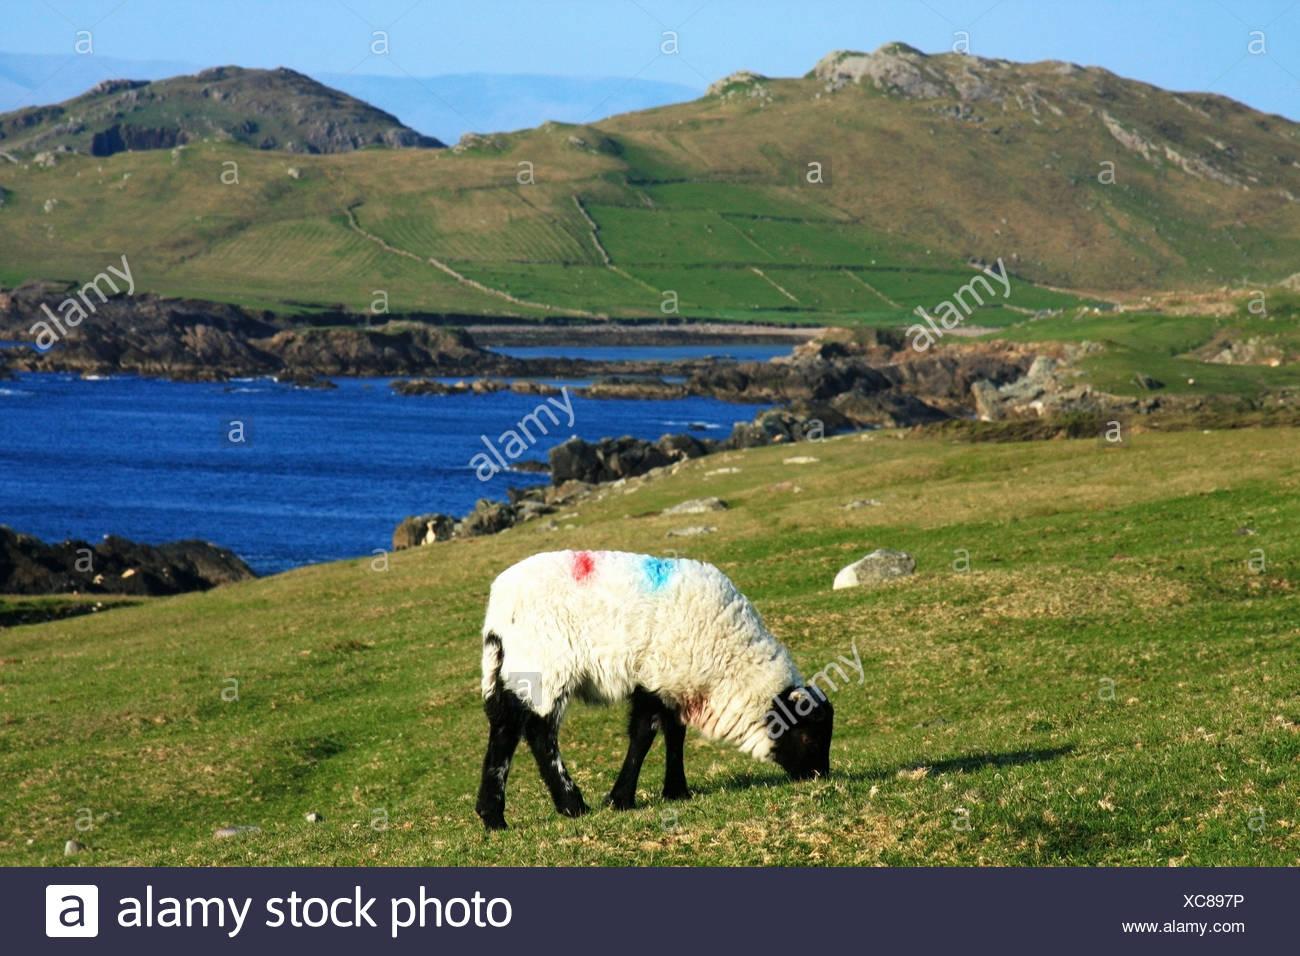 Sheep, Achill Island, County Mayo, Ireland - Stock Image